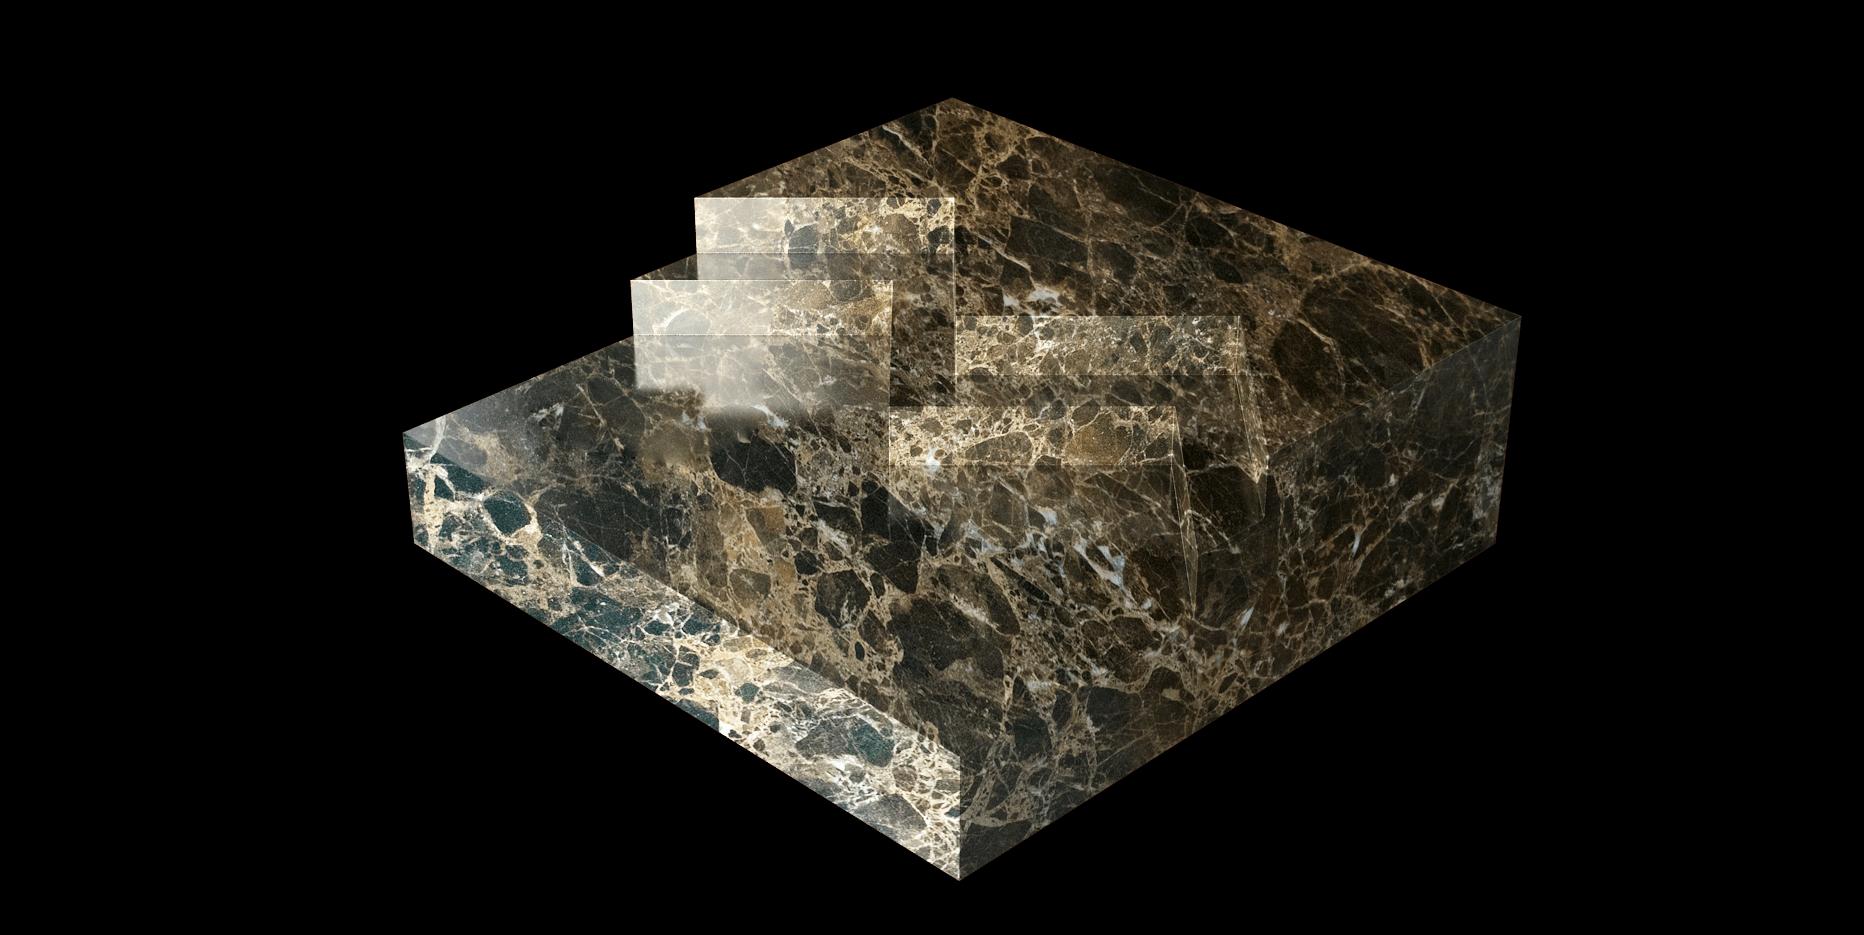 Emperador Dark фото 2 — камень от Bevers Marmyr